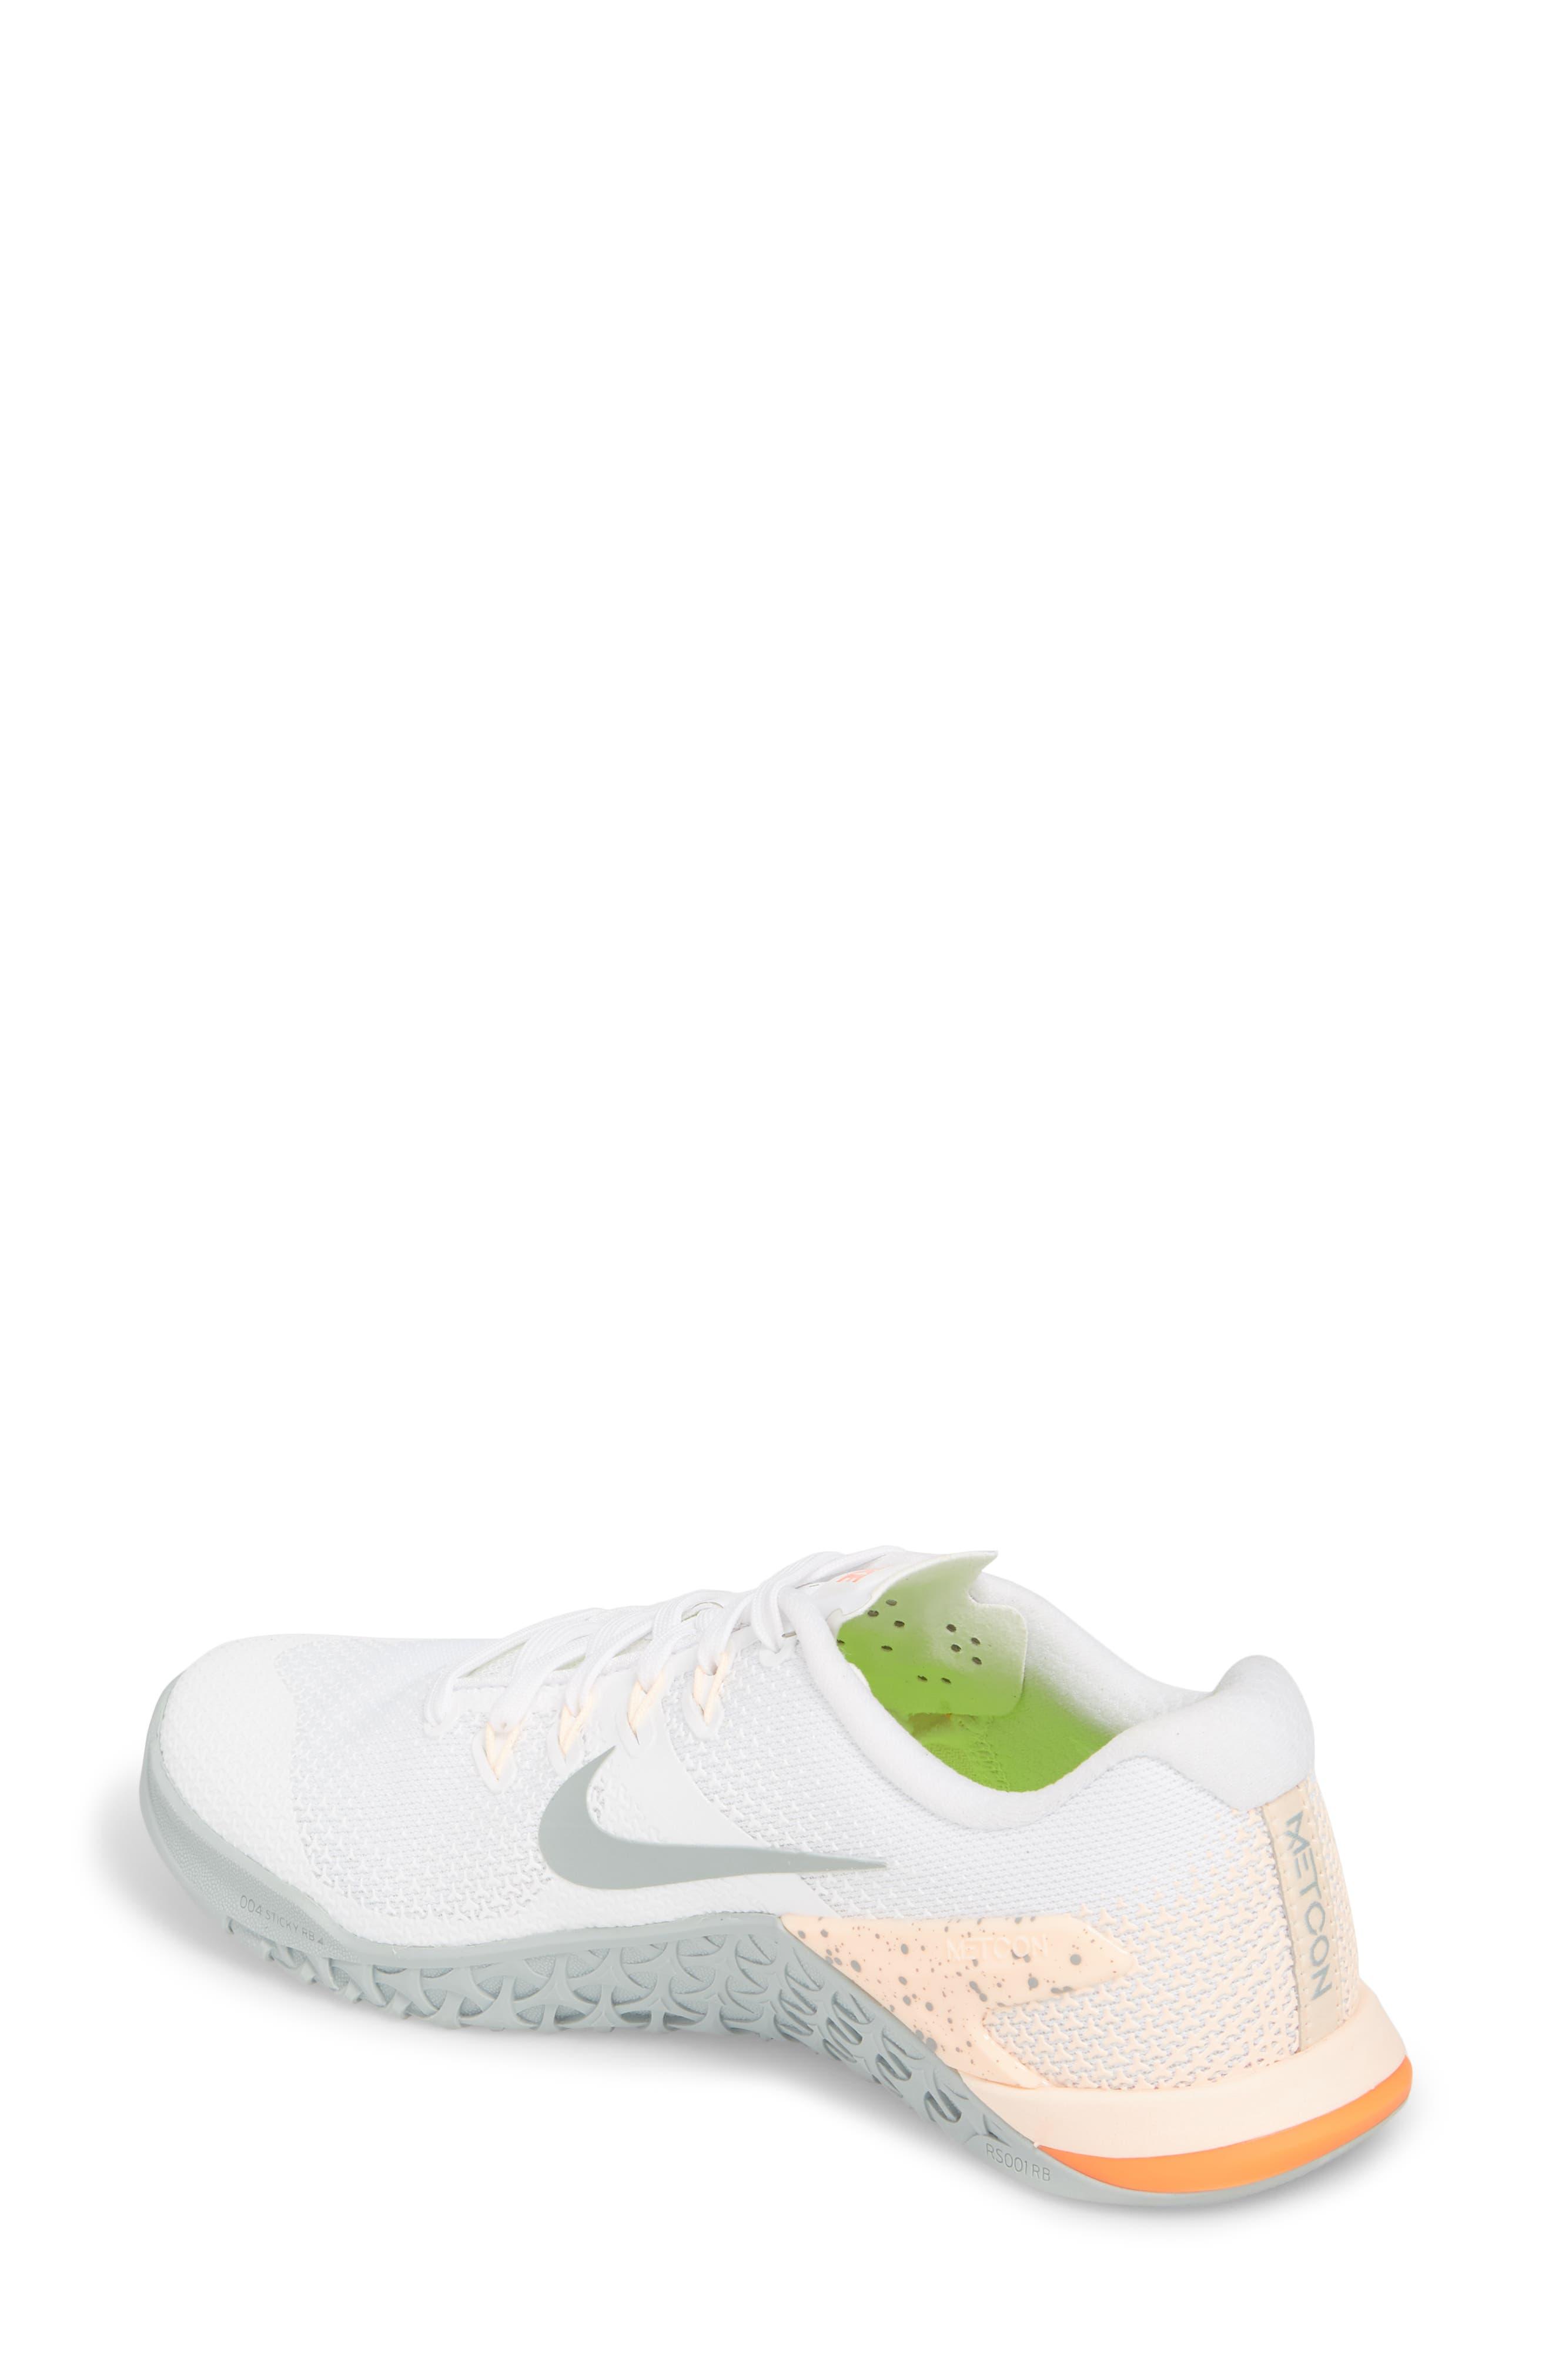 Metcon 4 Training Shoe,                             Alternate thumbnail 15, color,